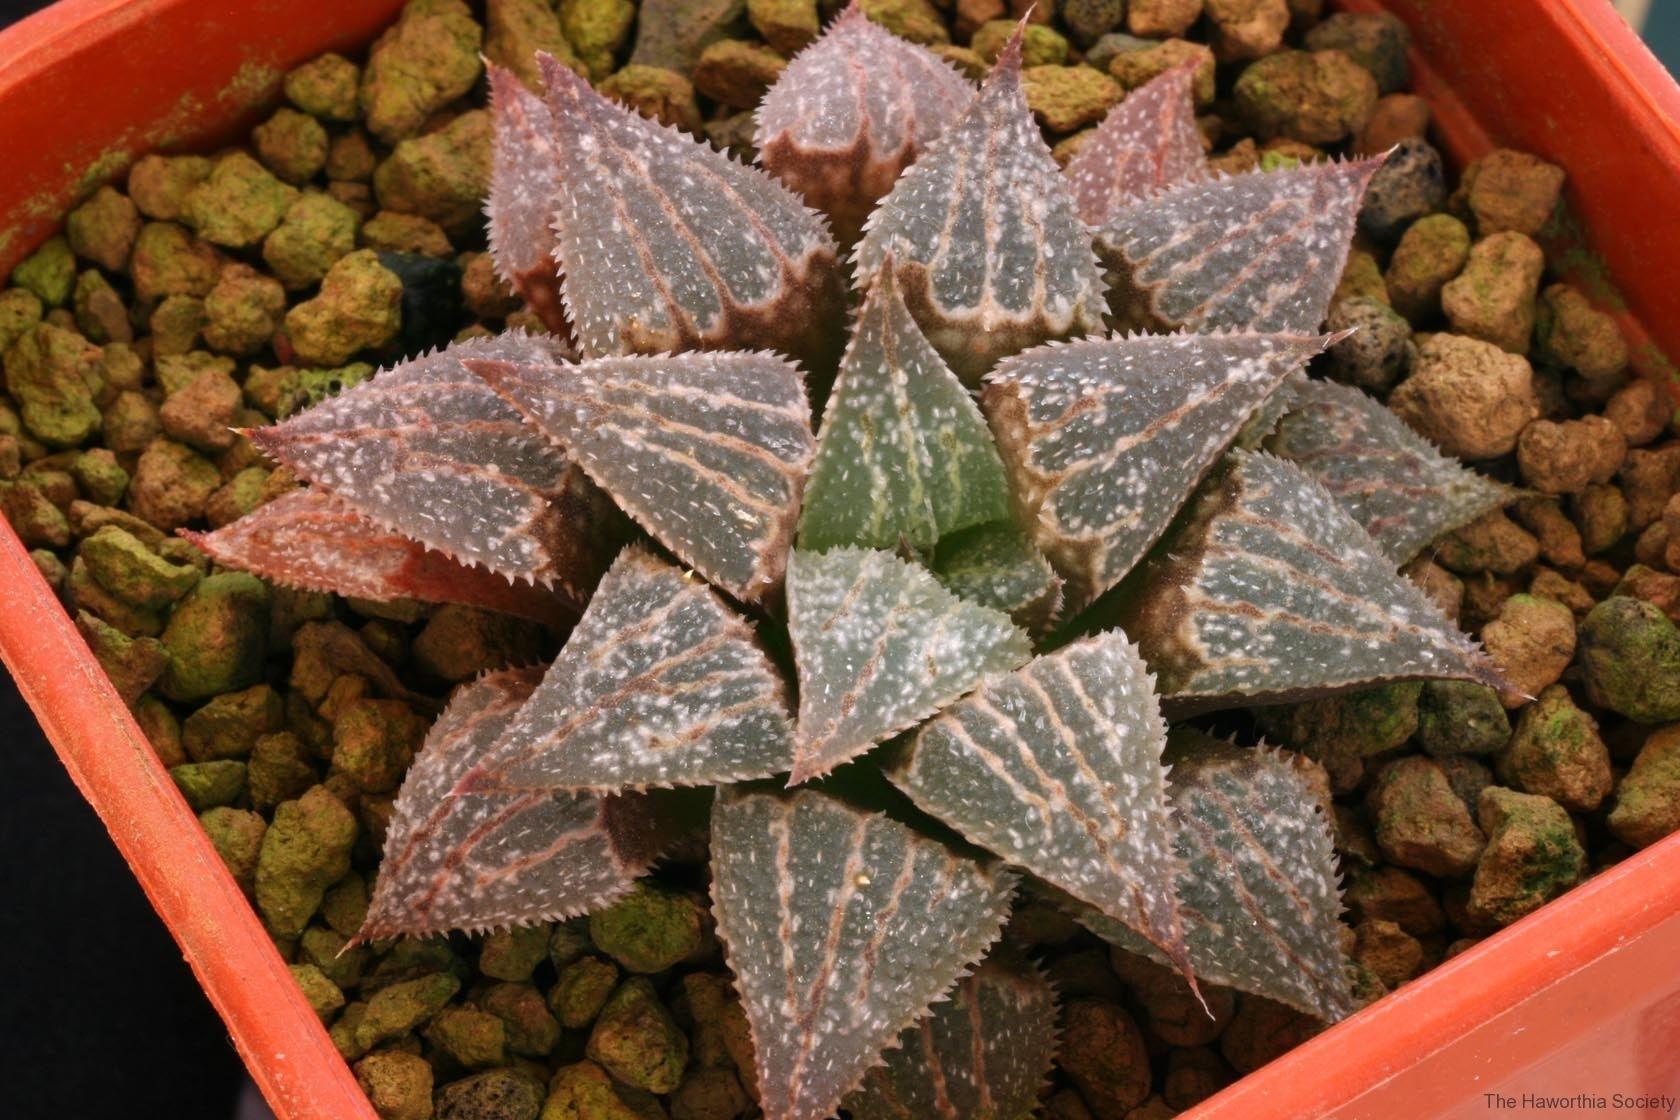 Haworthia emelyae v.major Hybrid Ham My own hybrid; In summer conditions